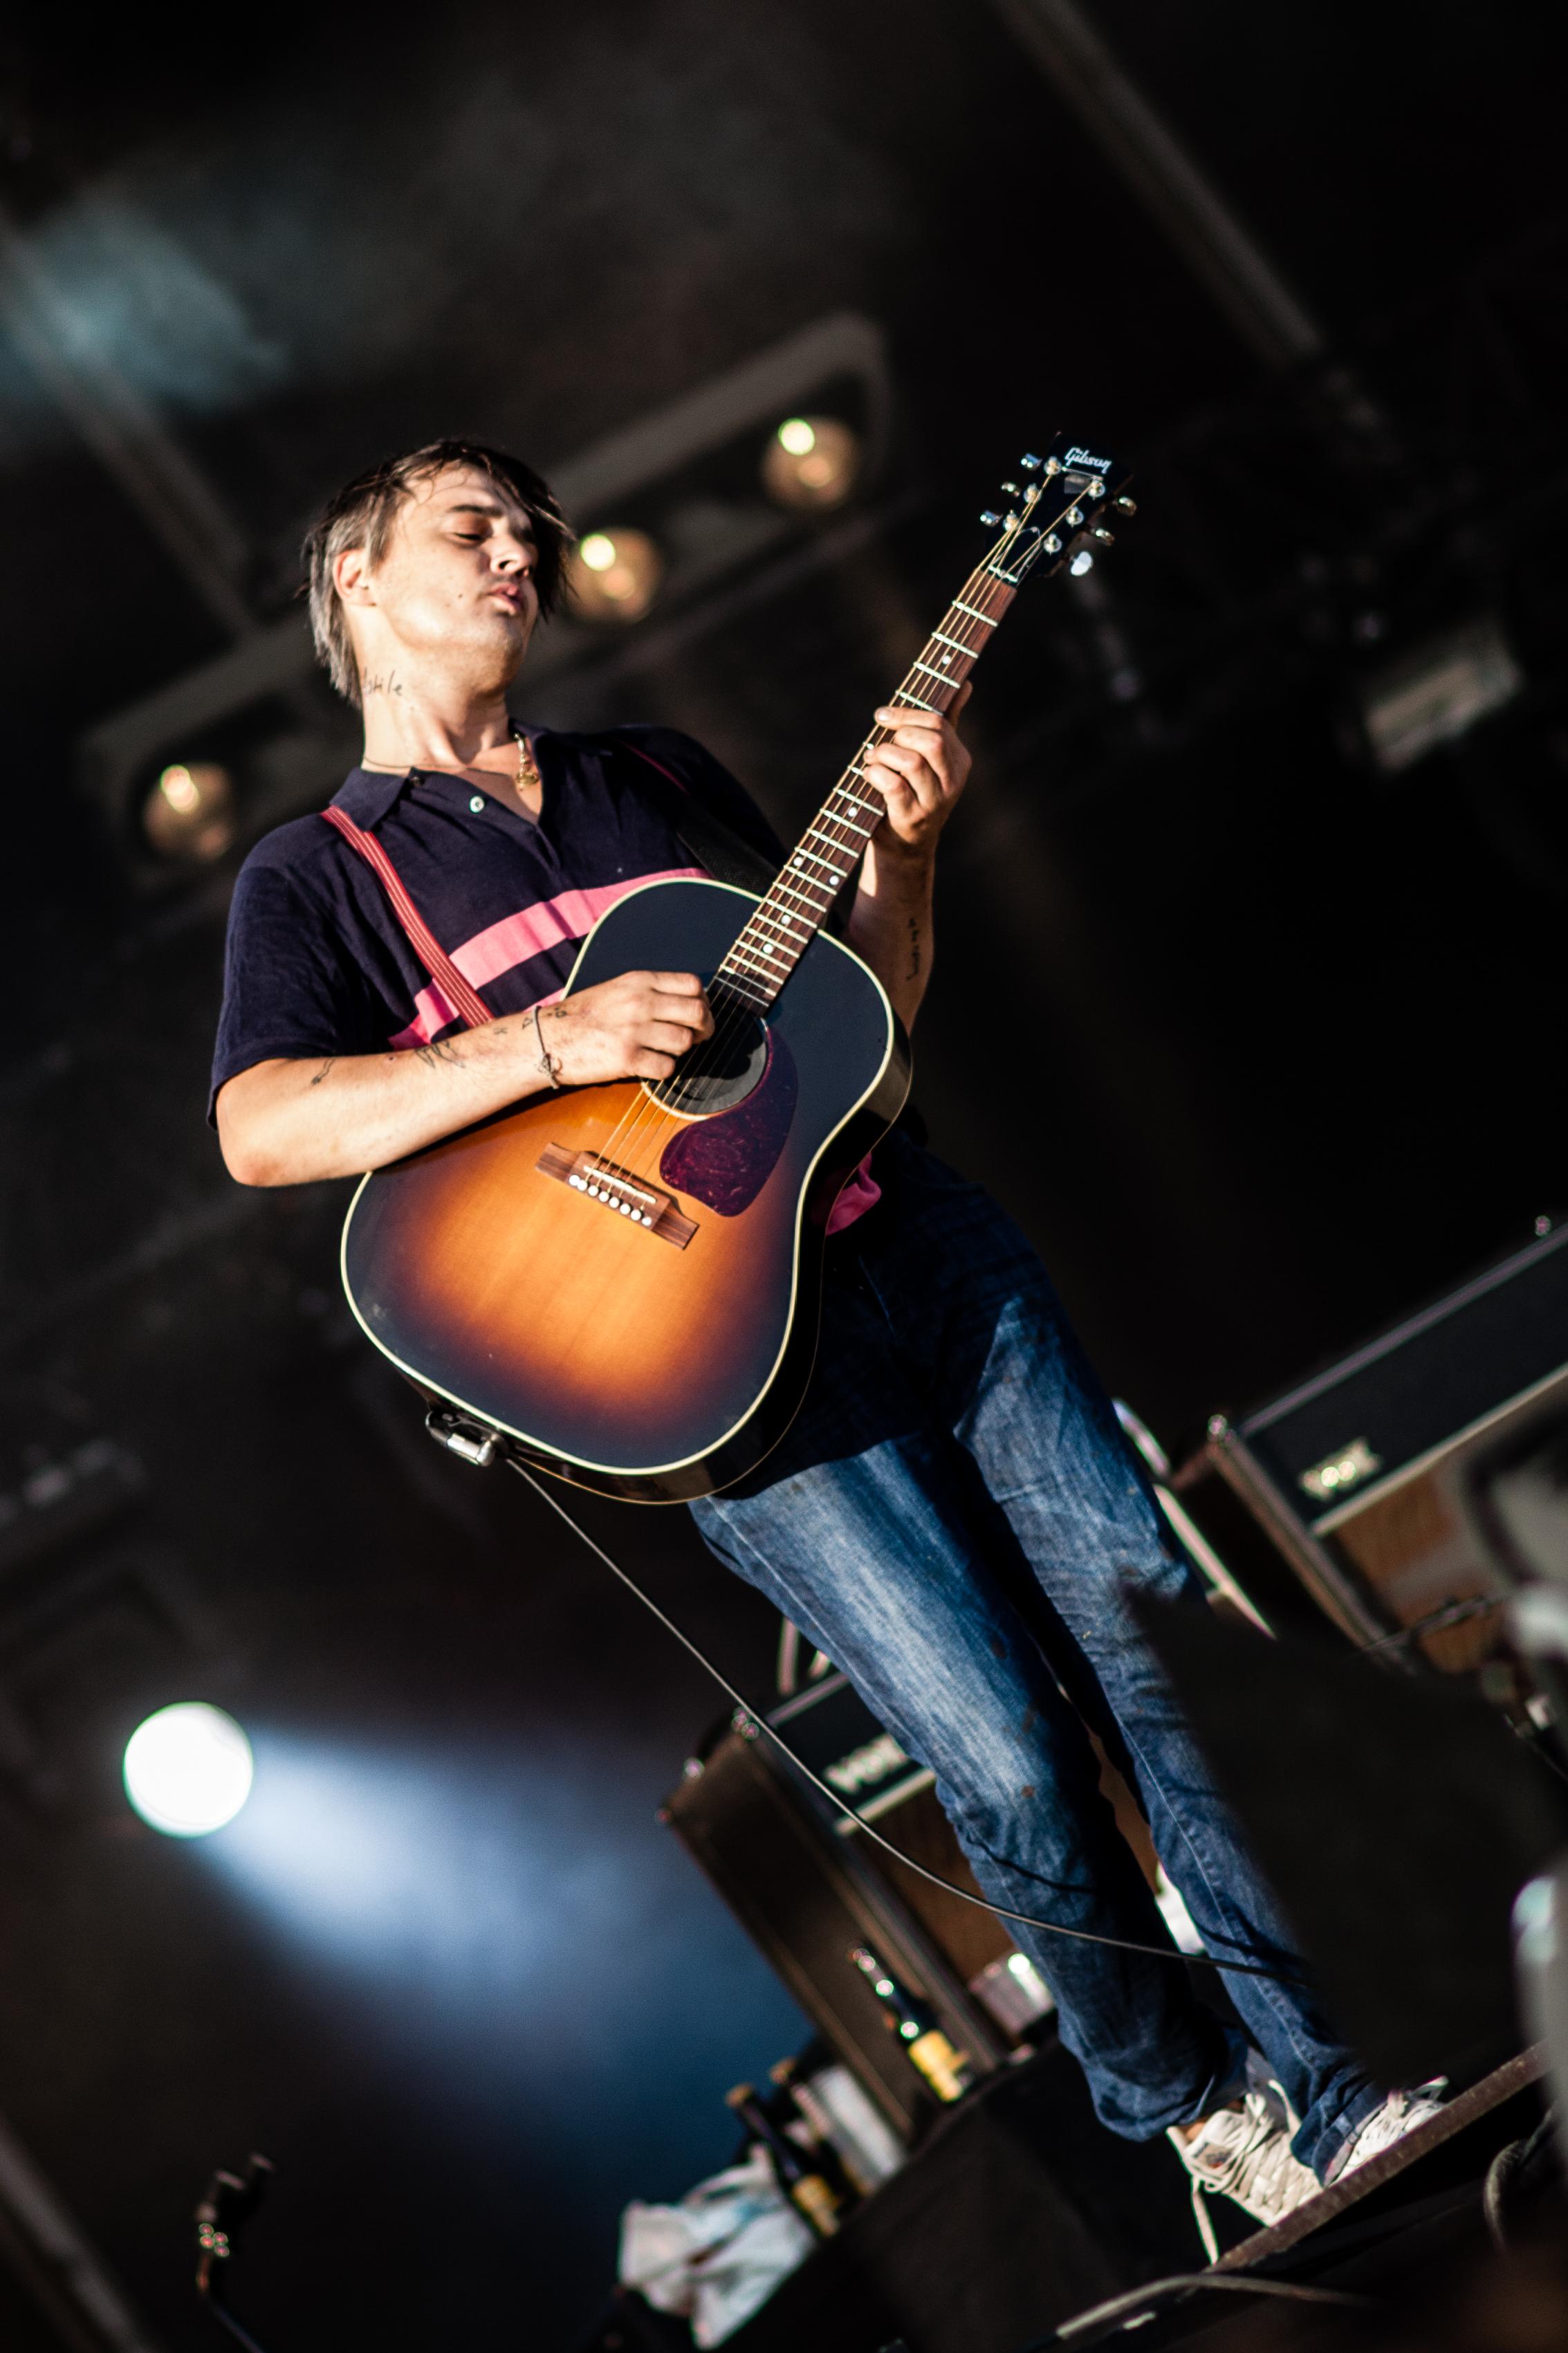 Kostenlose foto Musik Gitarre Leben Kanon Musiker Leistungskunst Festival 40d Stufe Grande Fest Humanit Huma Fetedelhumanit Doherty Pete